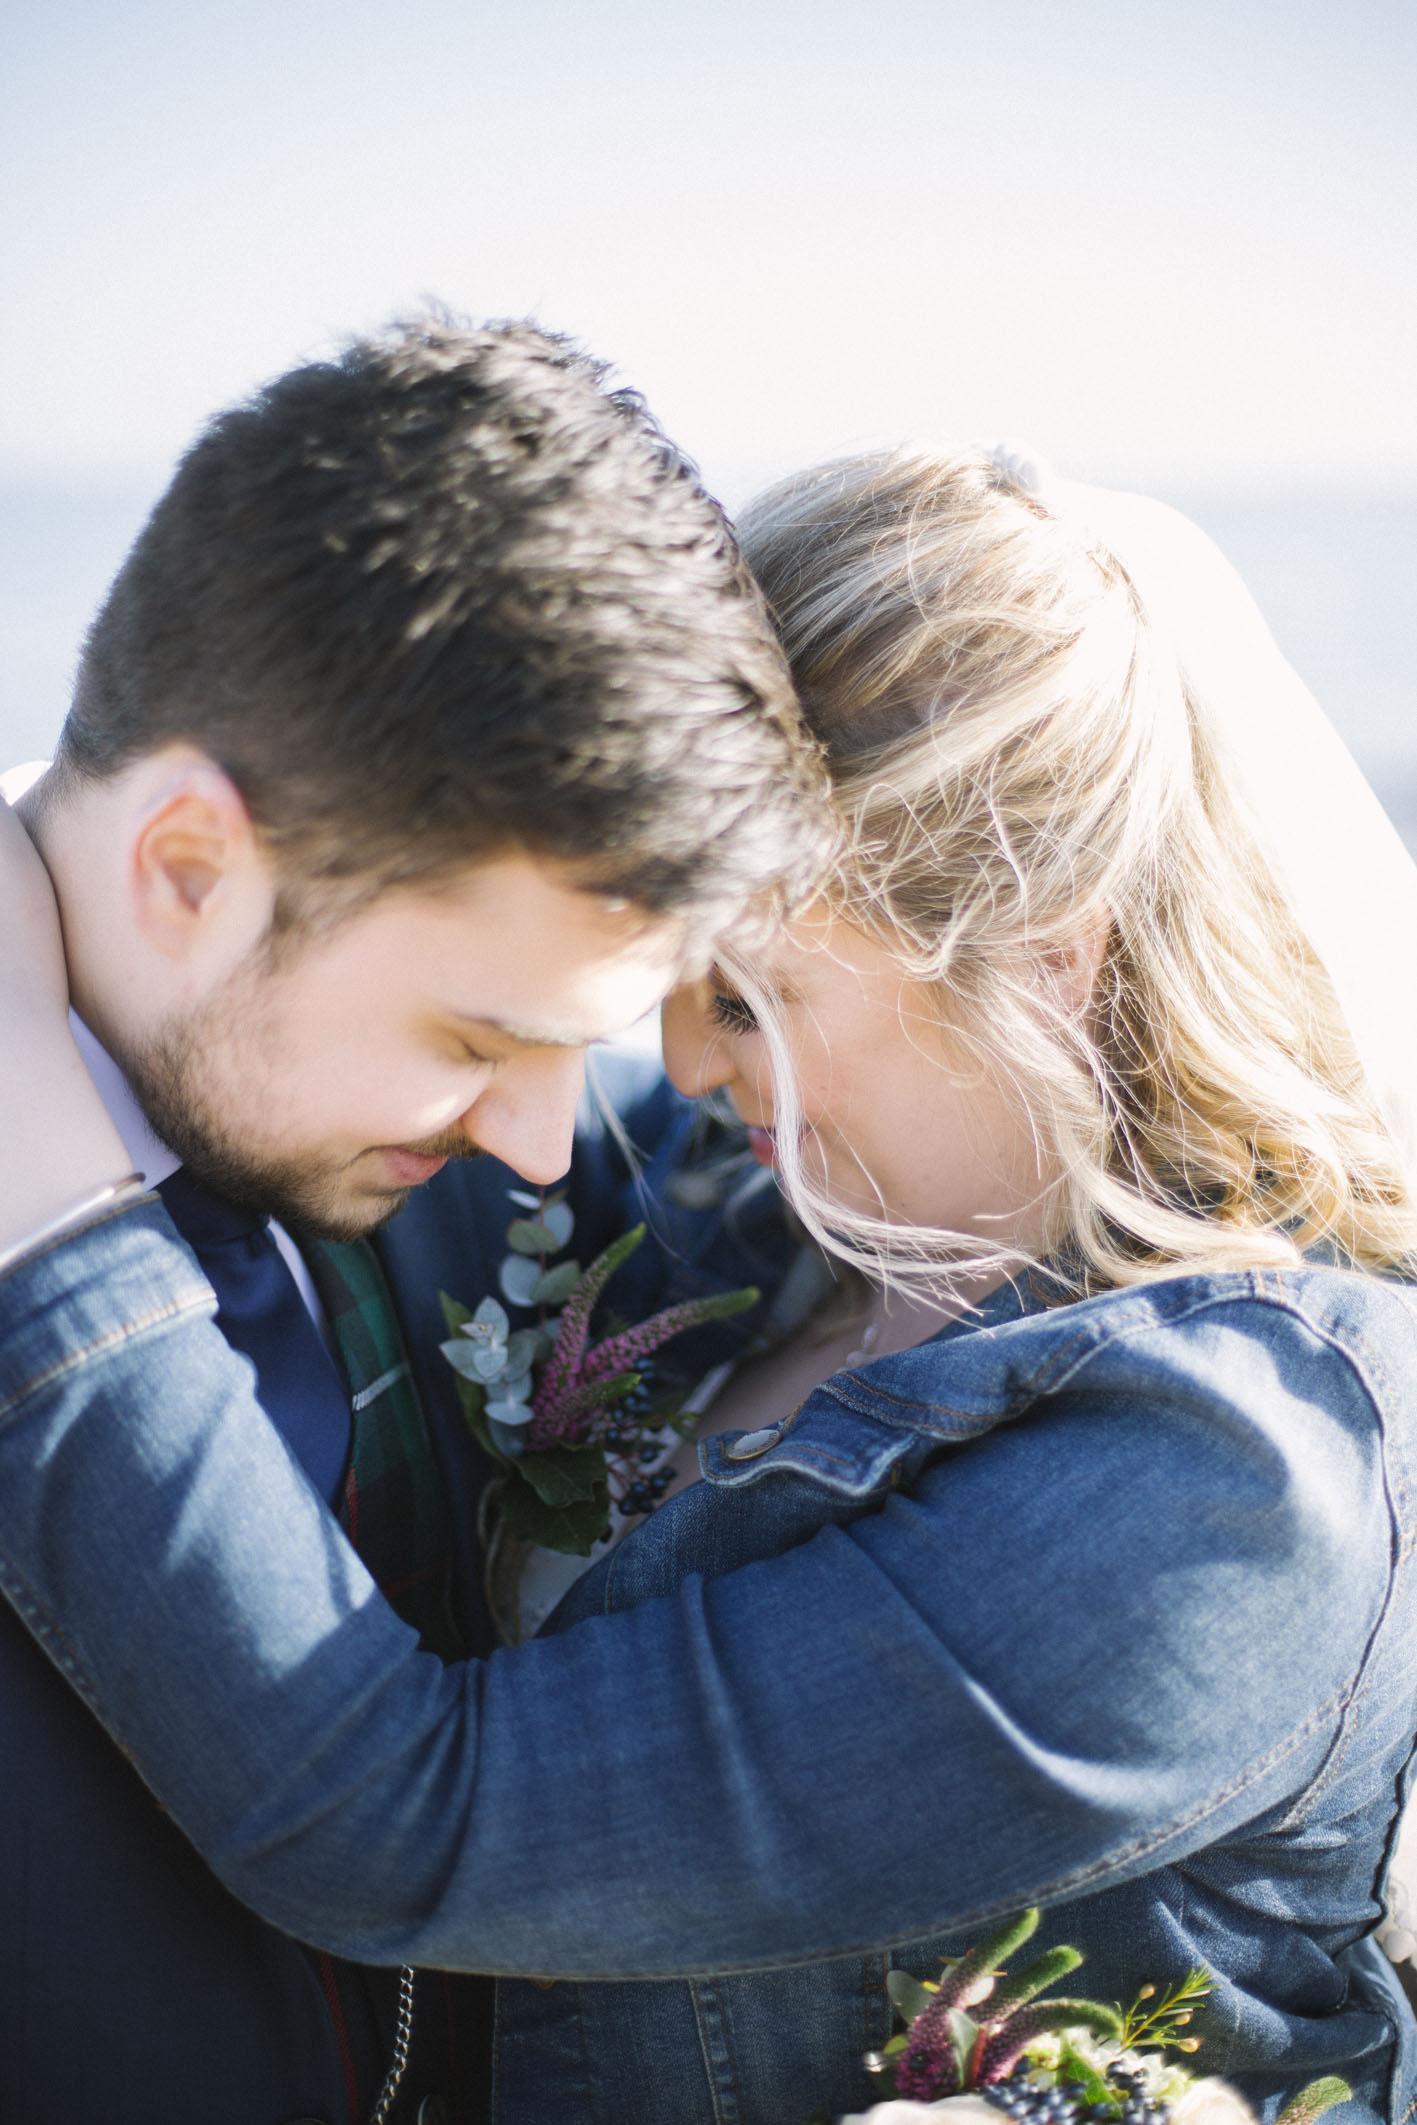 Dornoch Wedding Photography | Scottish Photographer | Alternative Photos | Ceranna Photography | intimate elopement | beach wedding | east coast scotlandDornoch Wedding Photography | Scottish Photographer | Alternative Photos | Ceranna Photography | intimate elopement | beach wedding | east coast scotland